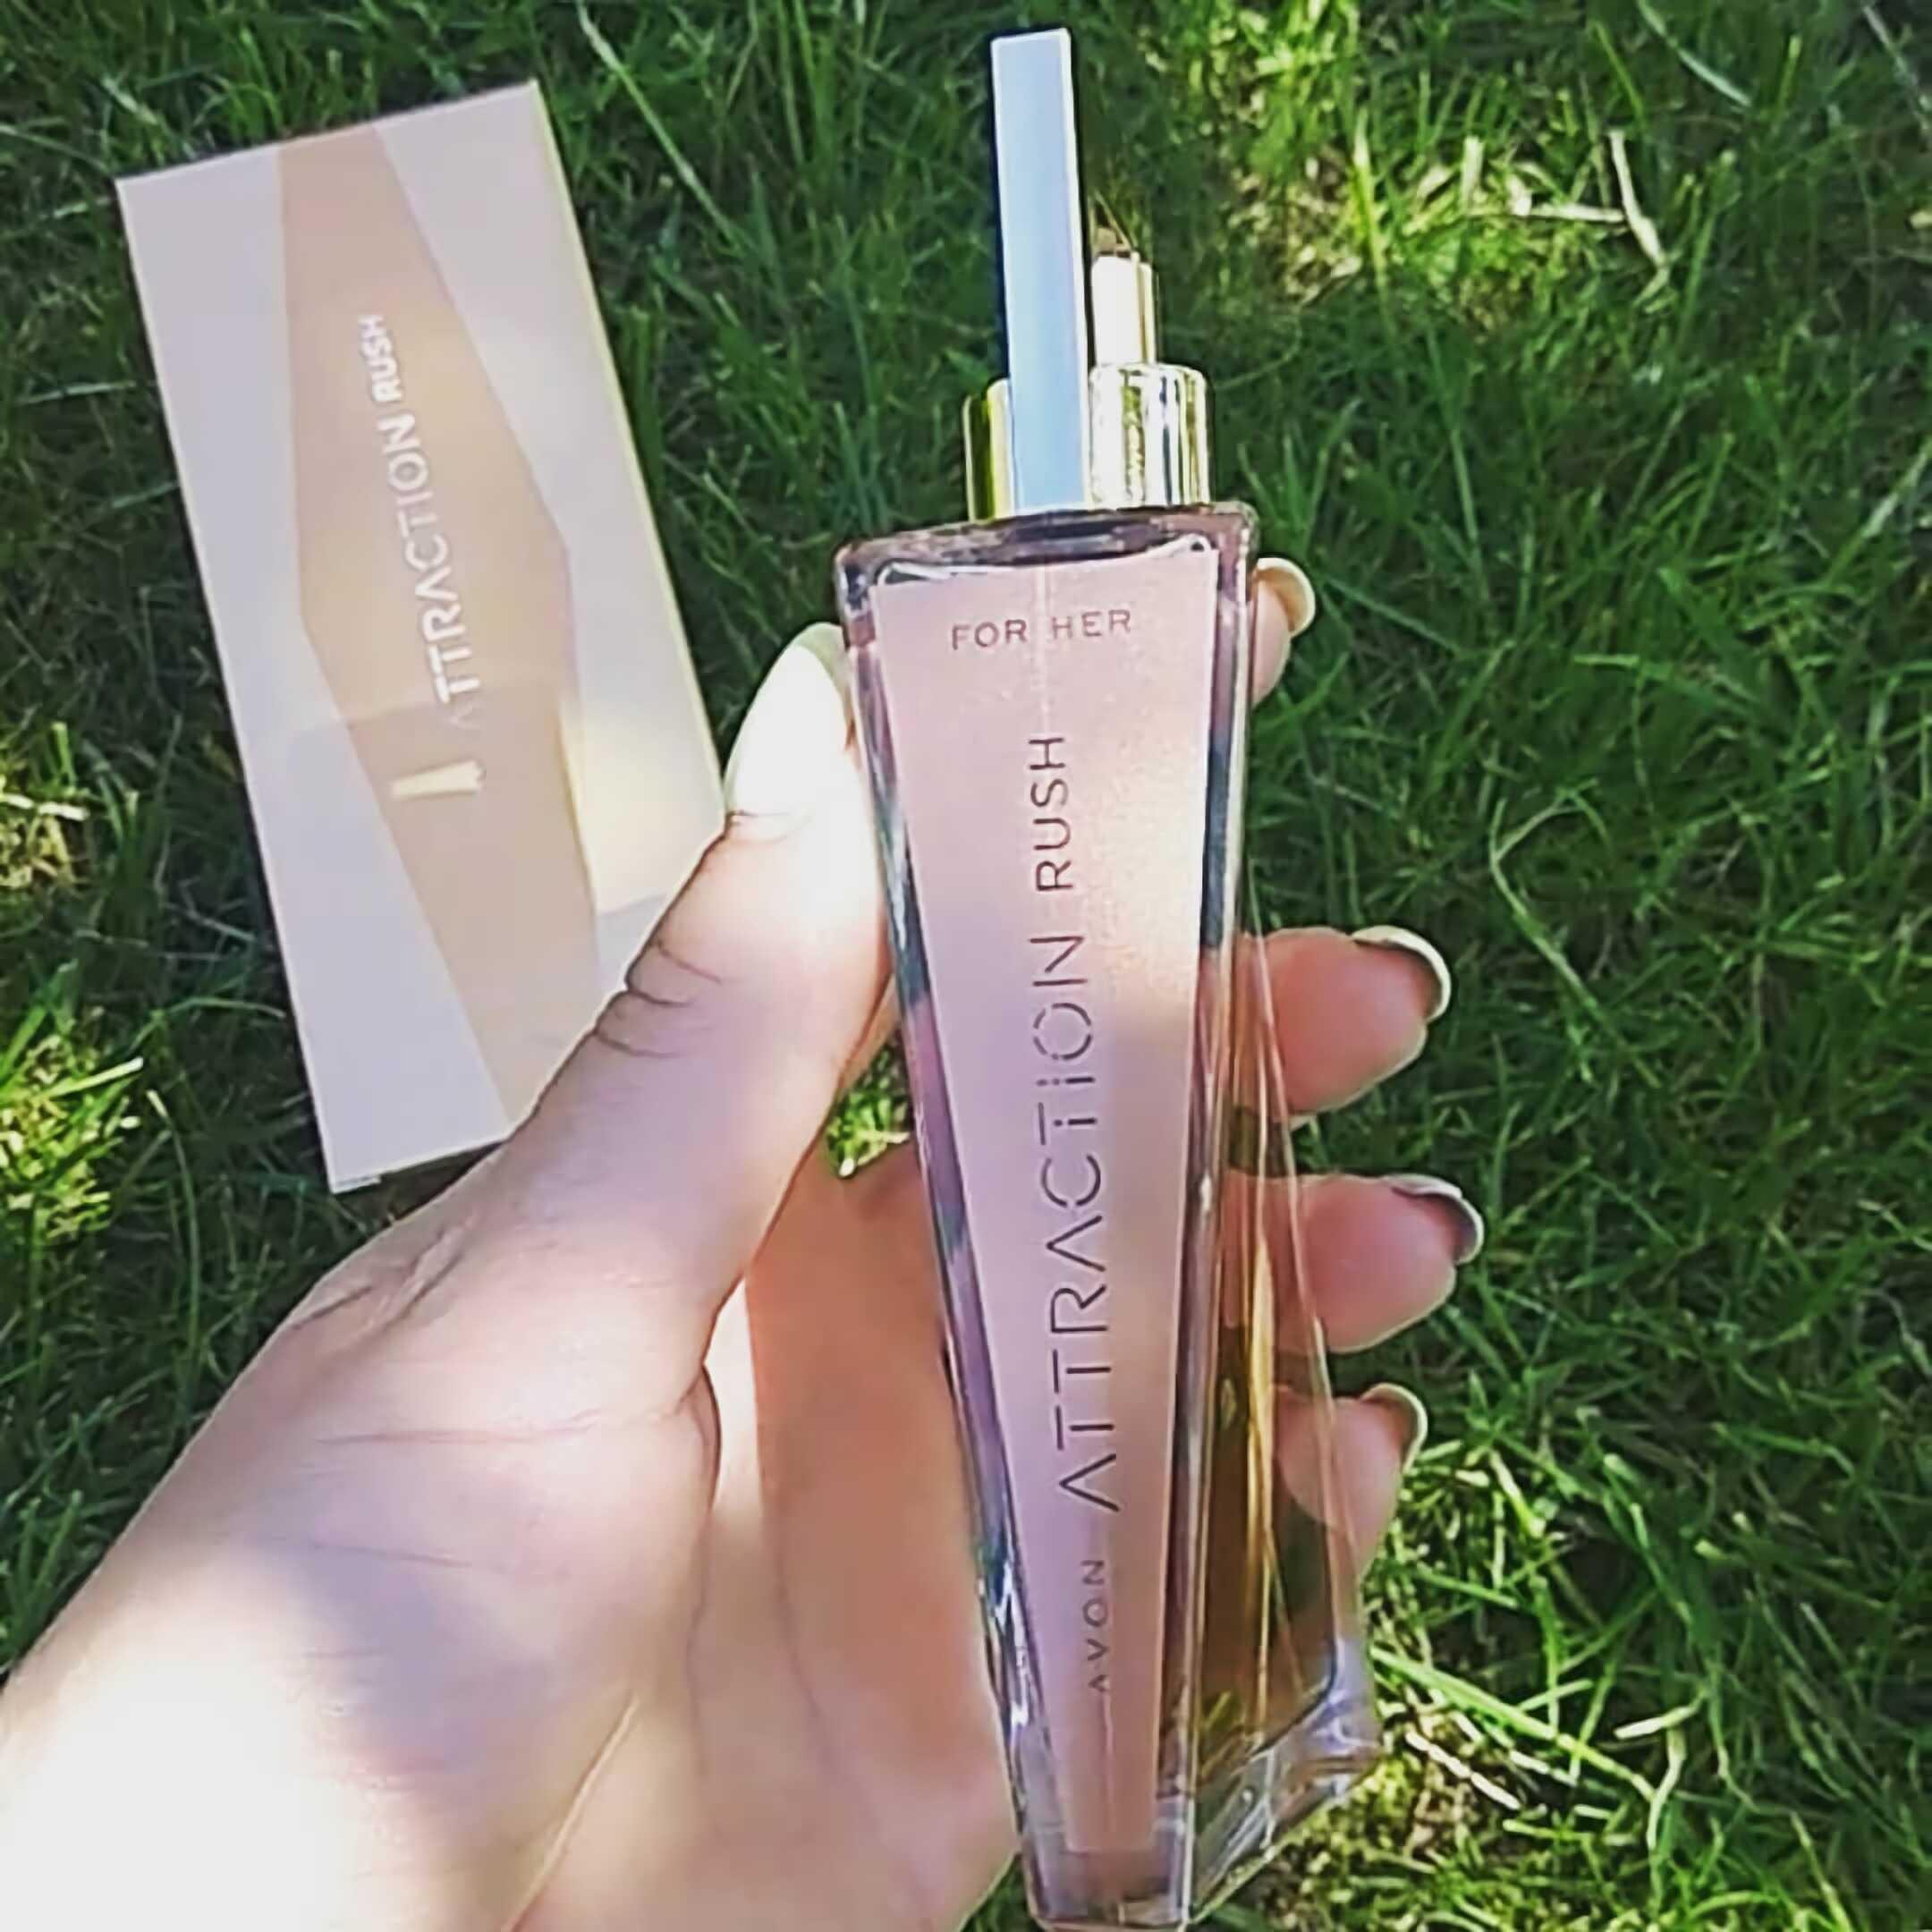 парфюм для девушек с тропическим запахом Avon Attraction Rush for Her